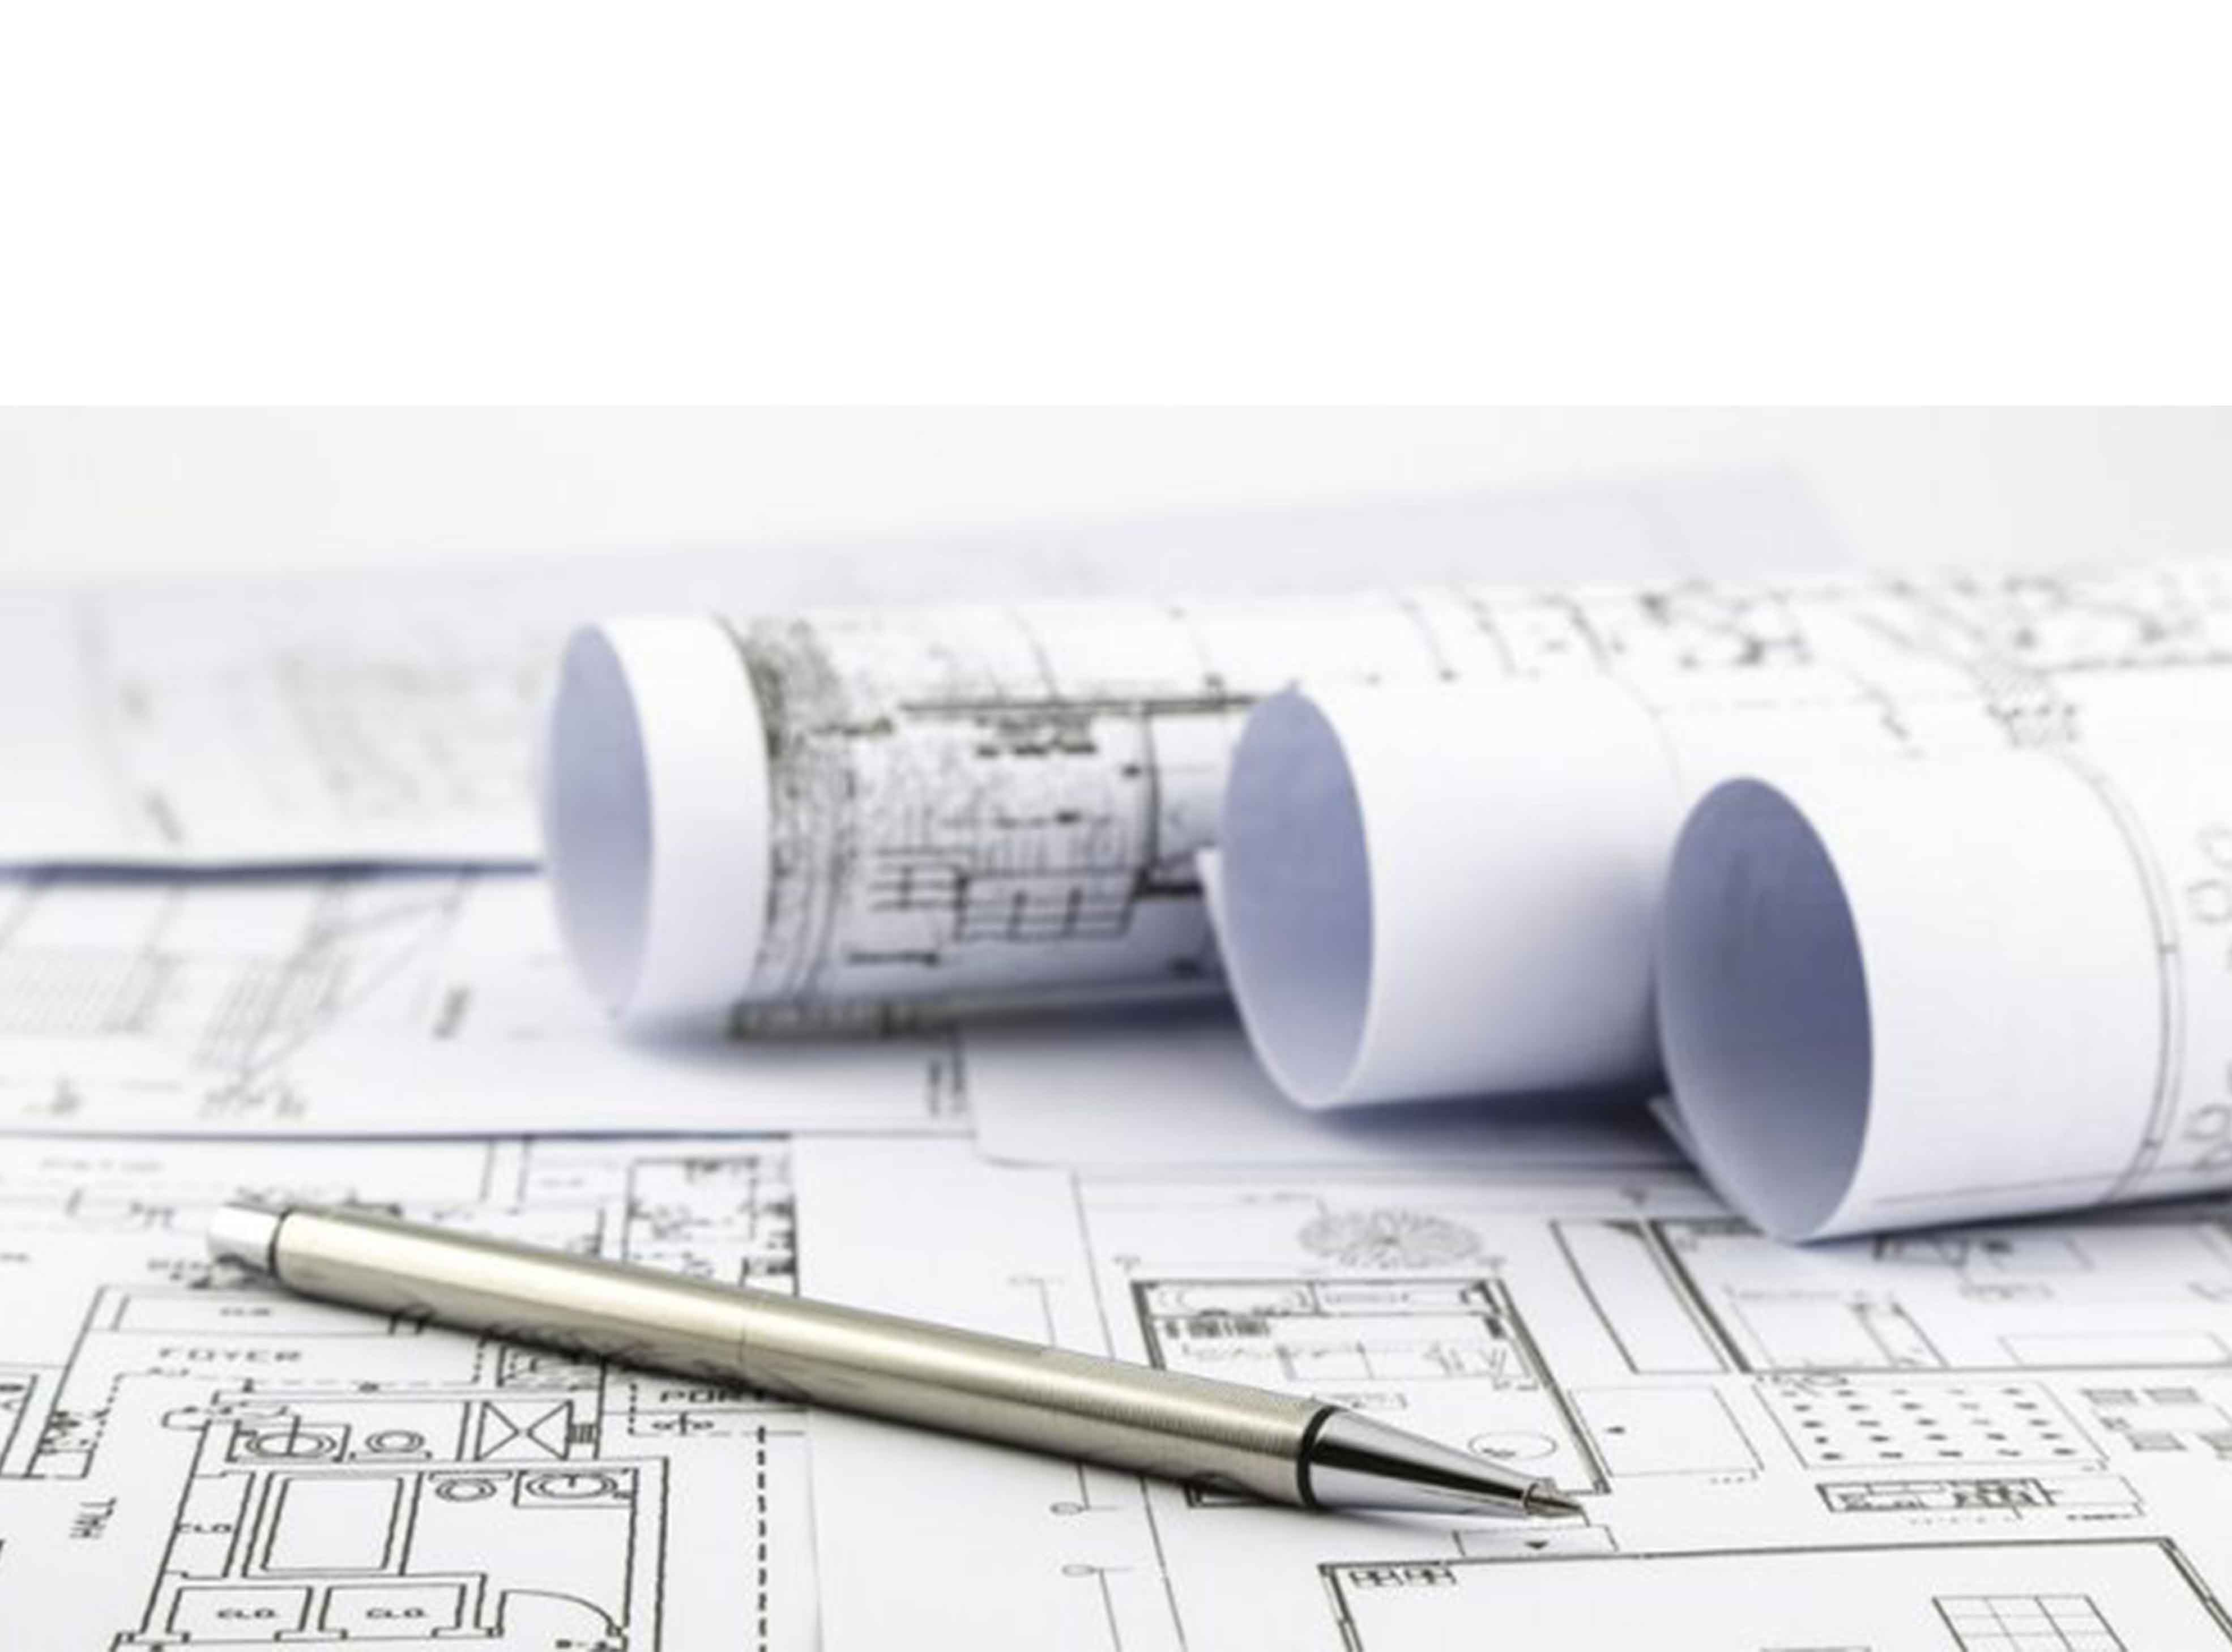 Planprint Image